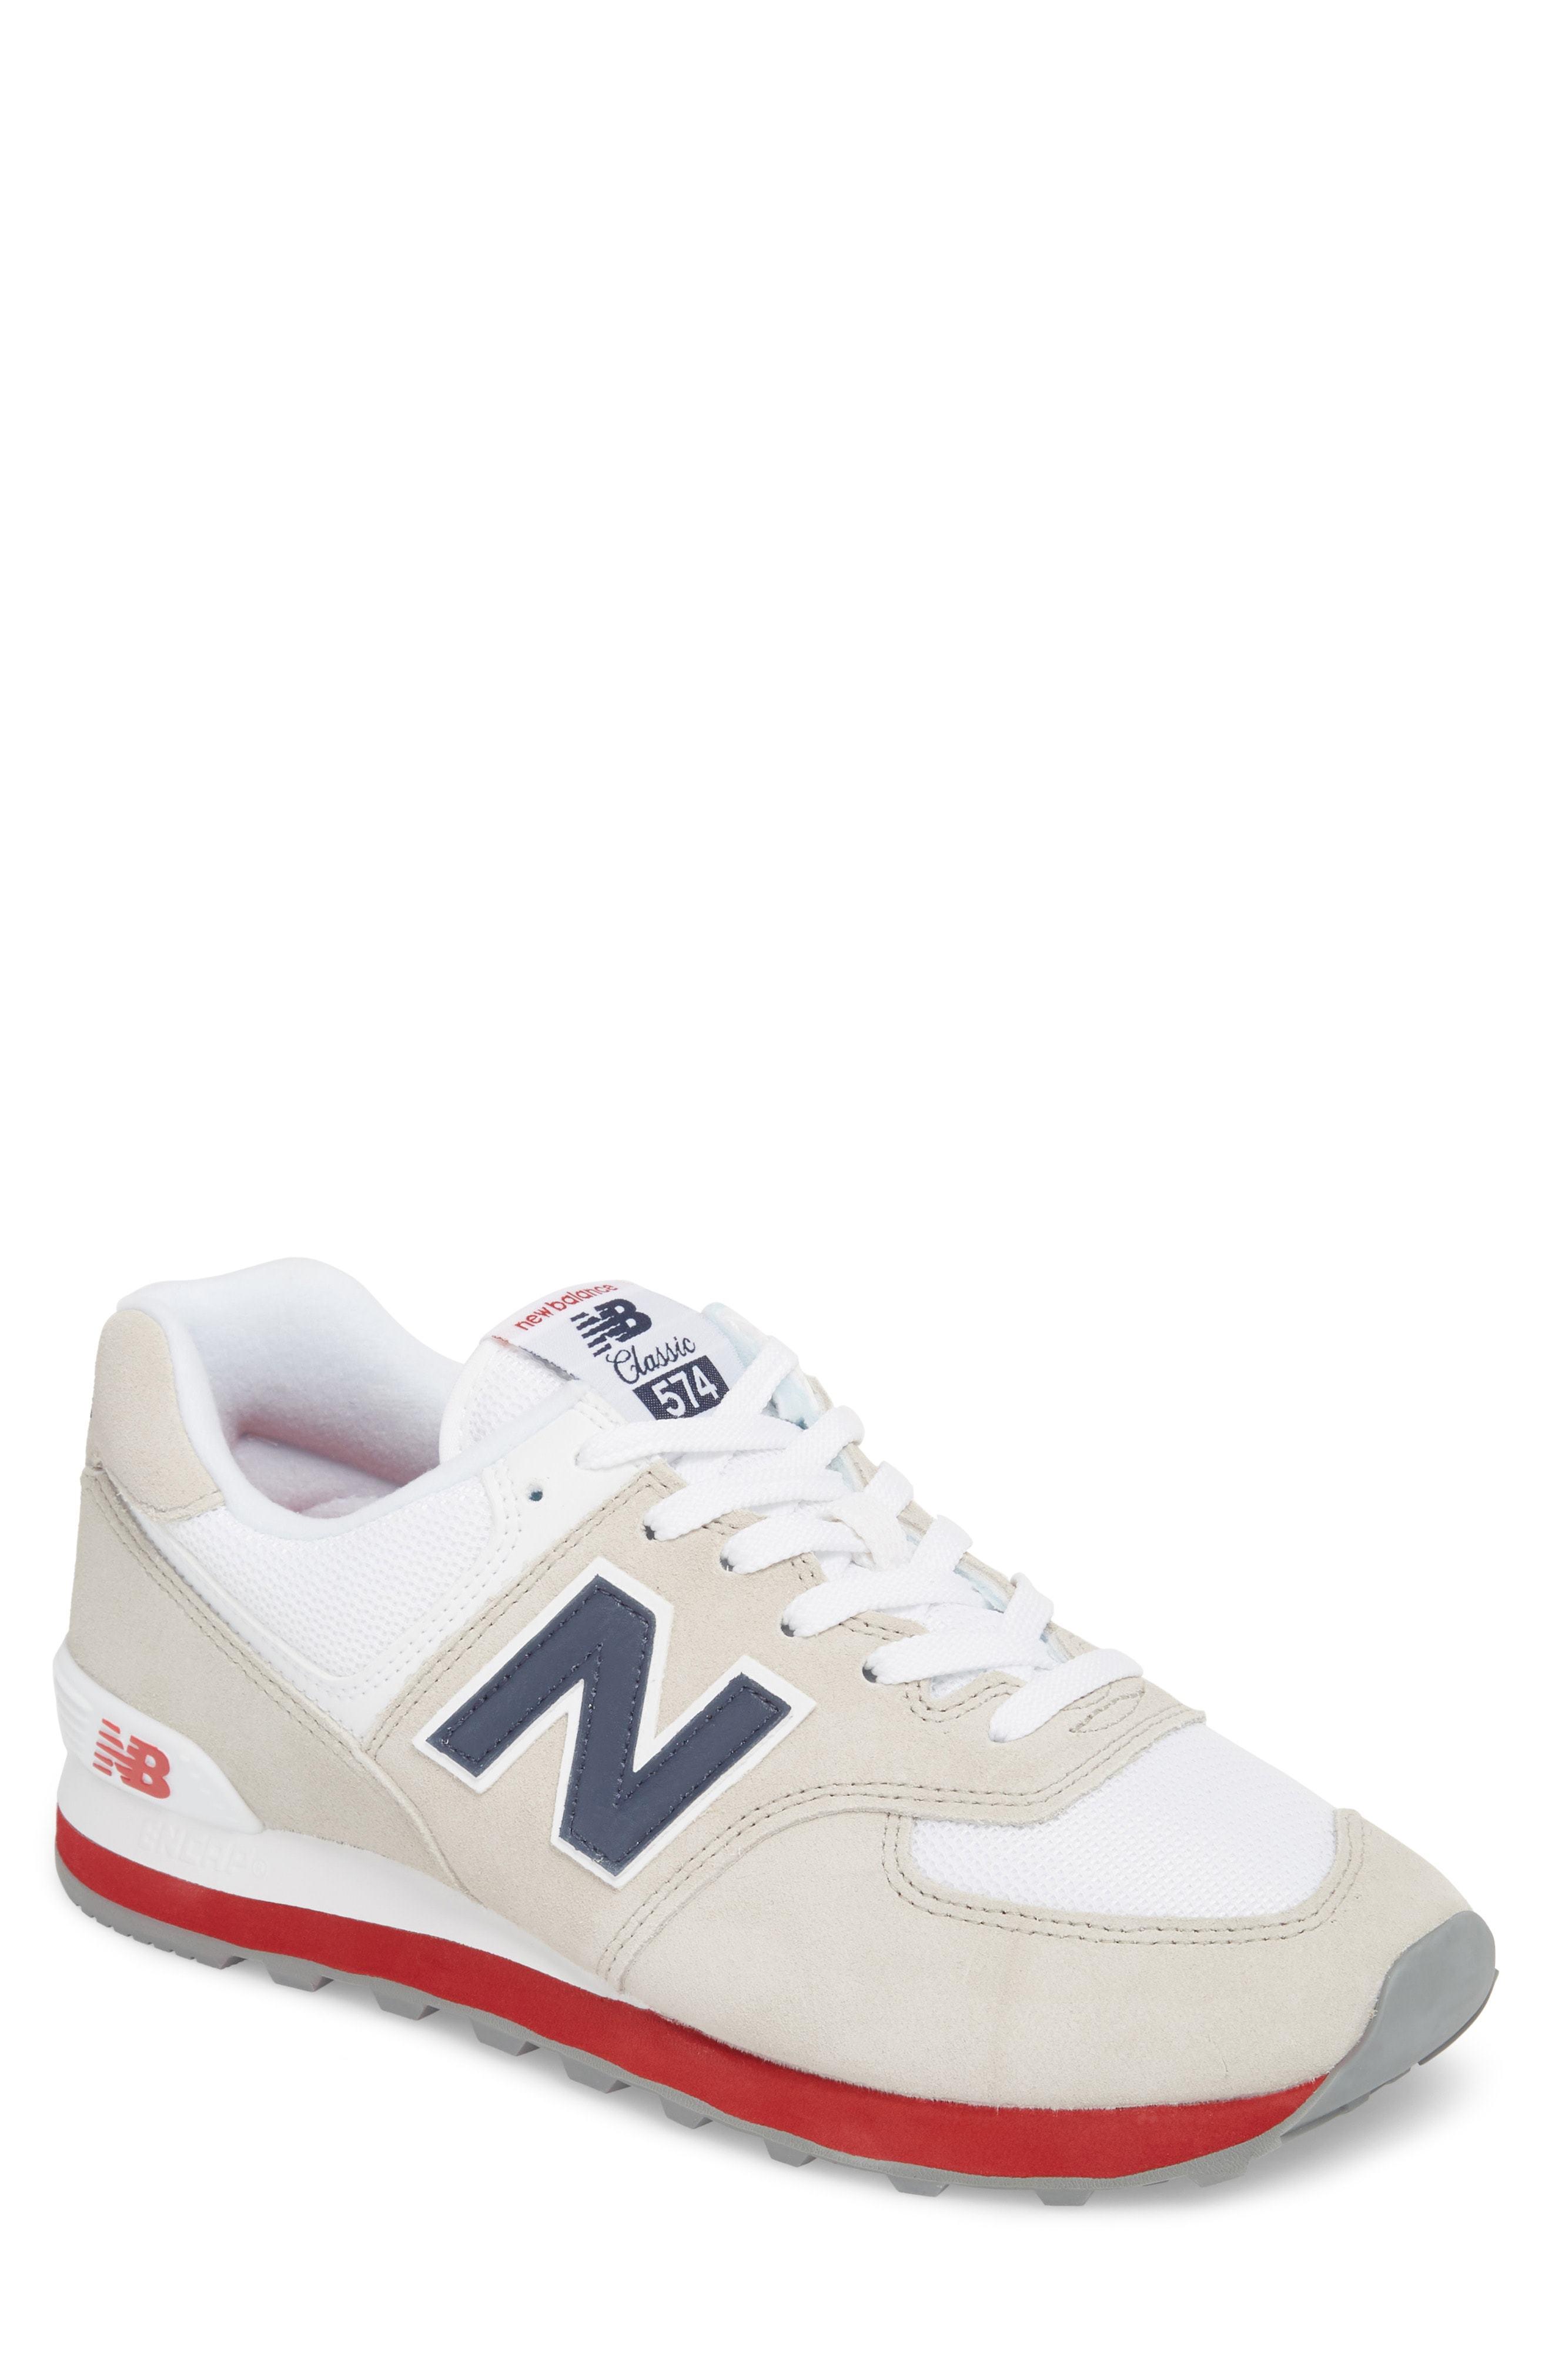 New Balance 574 Retro Surf Sneaker, $47